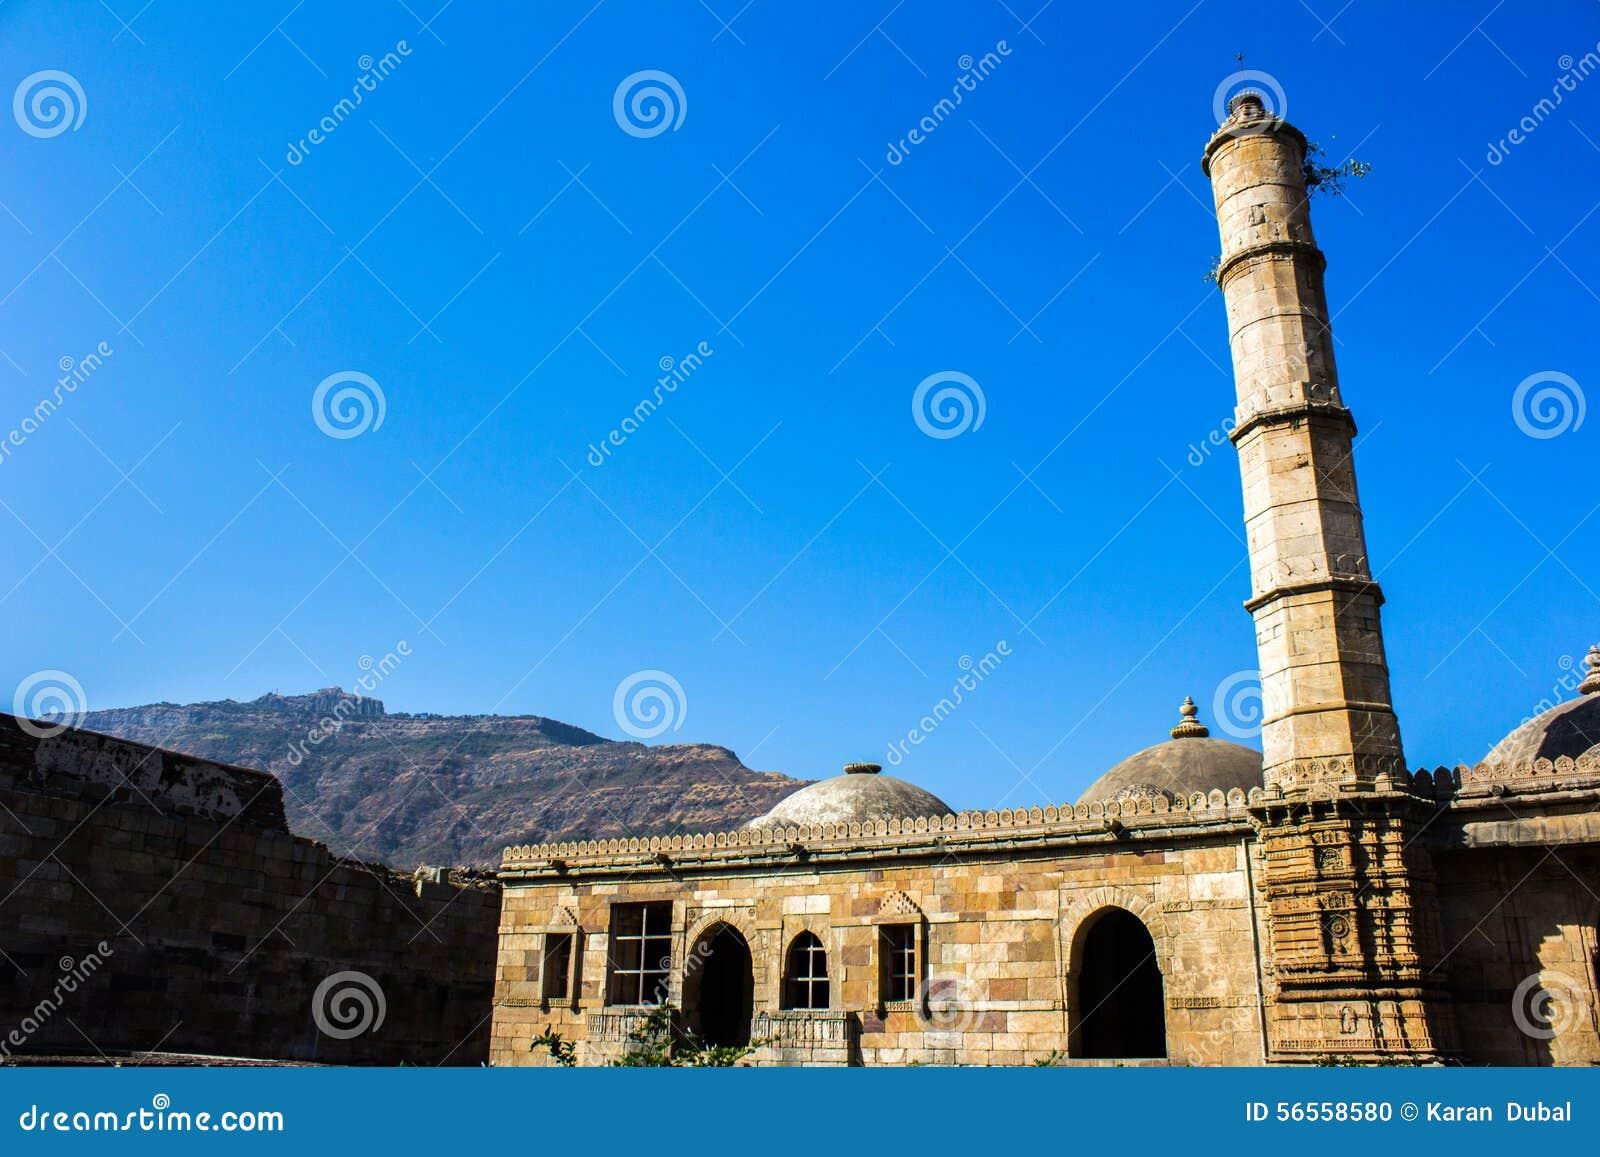 Download Μουσουλμανικό τέμενος Champaner στο Gujarat, Ινδία Στοκ Εικόνες - εικόνα από πρωινός, έξω: 56558580